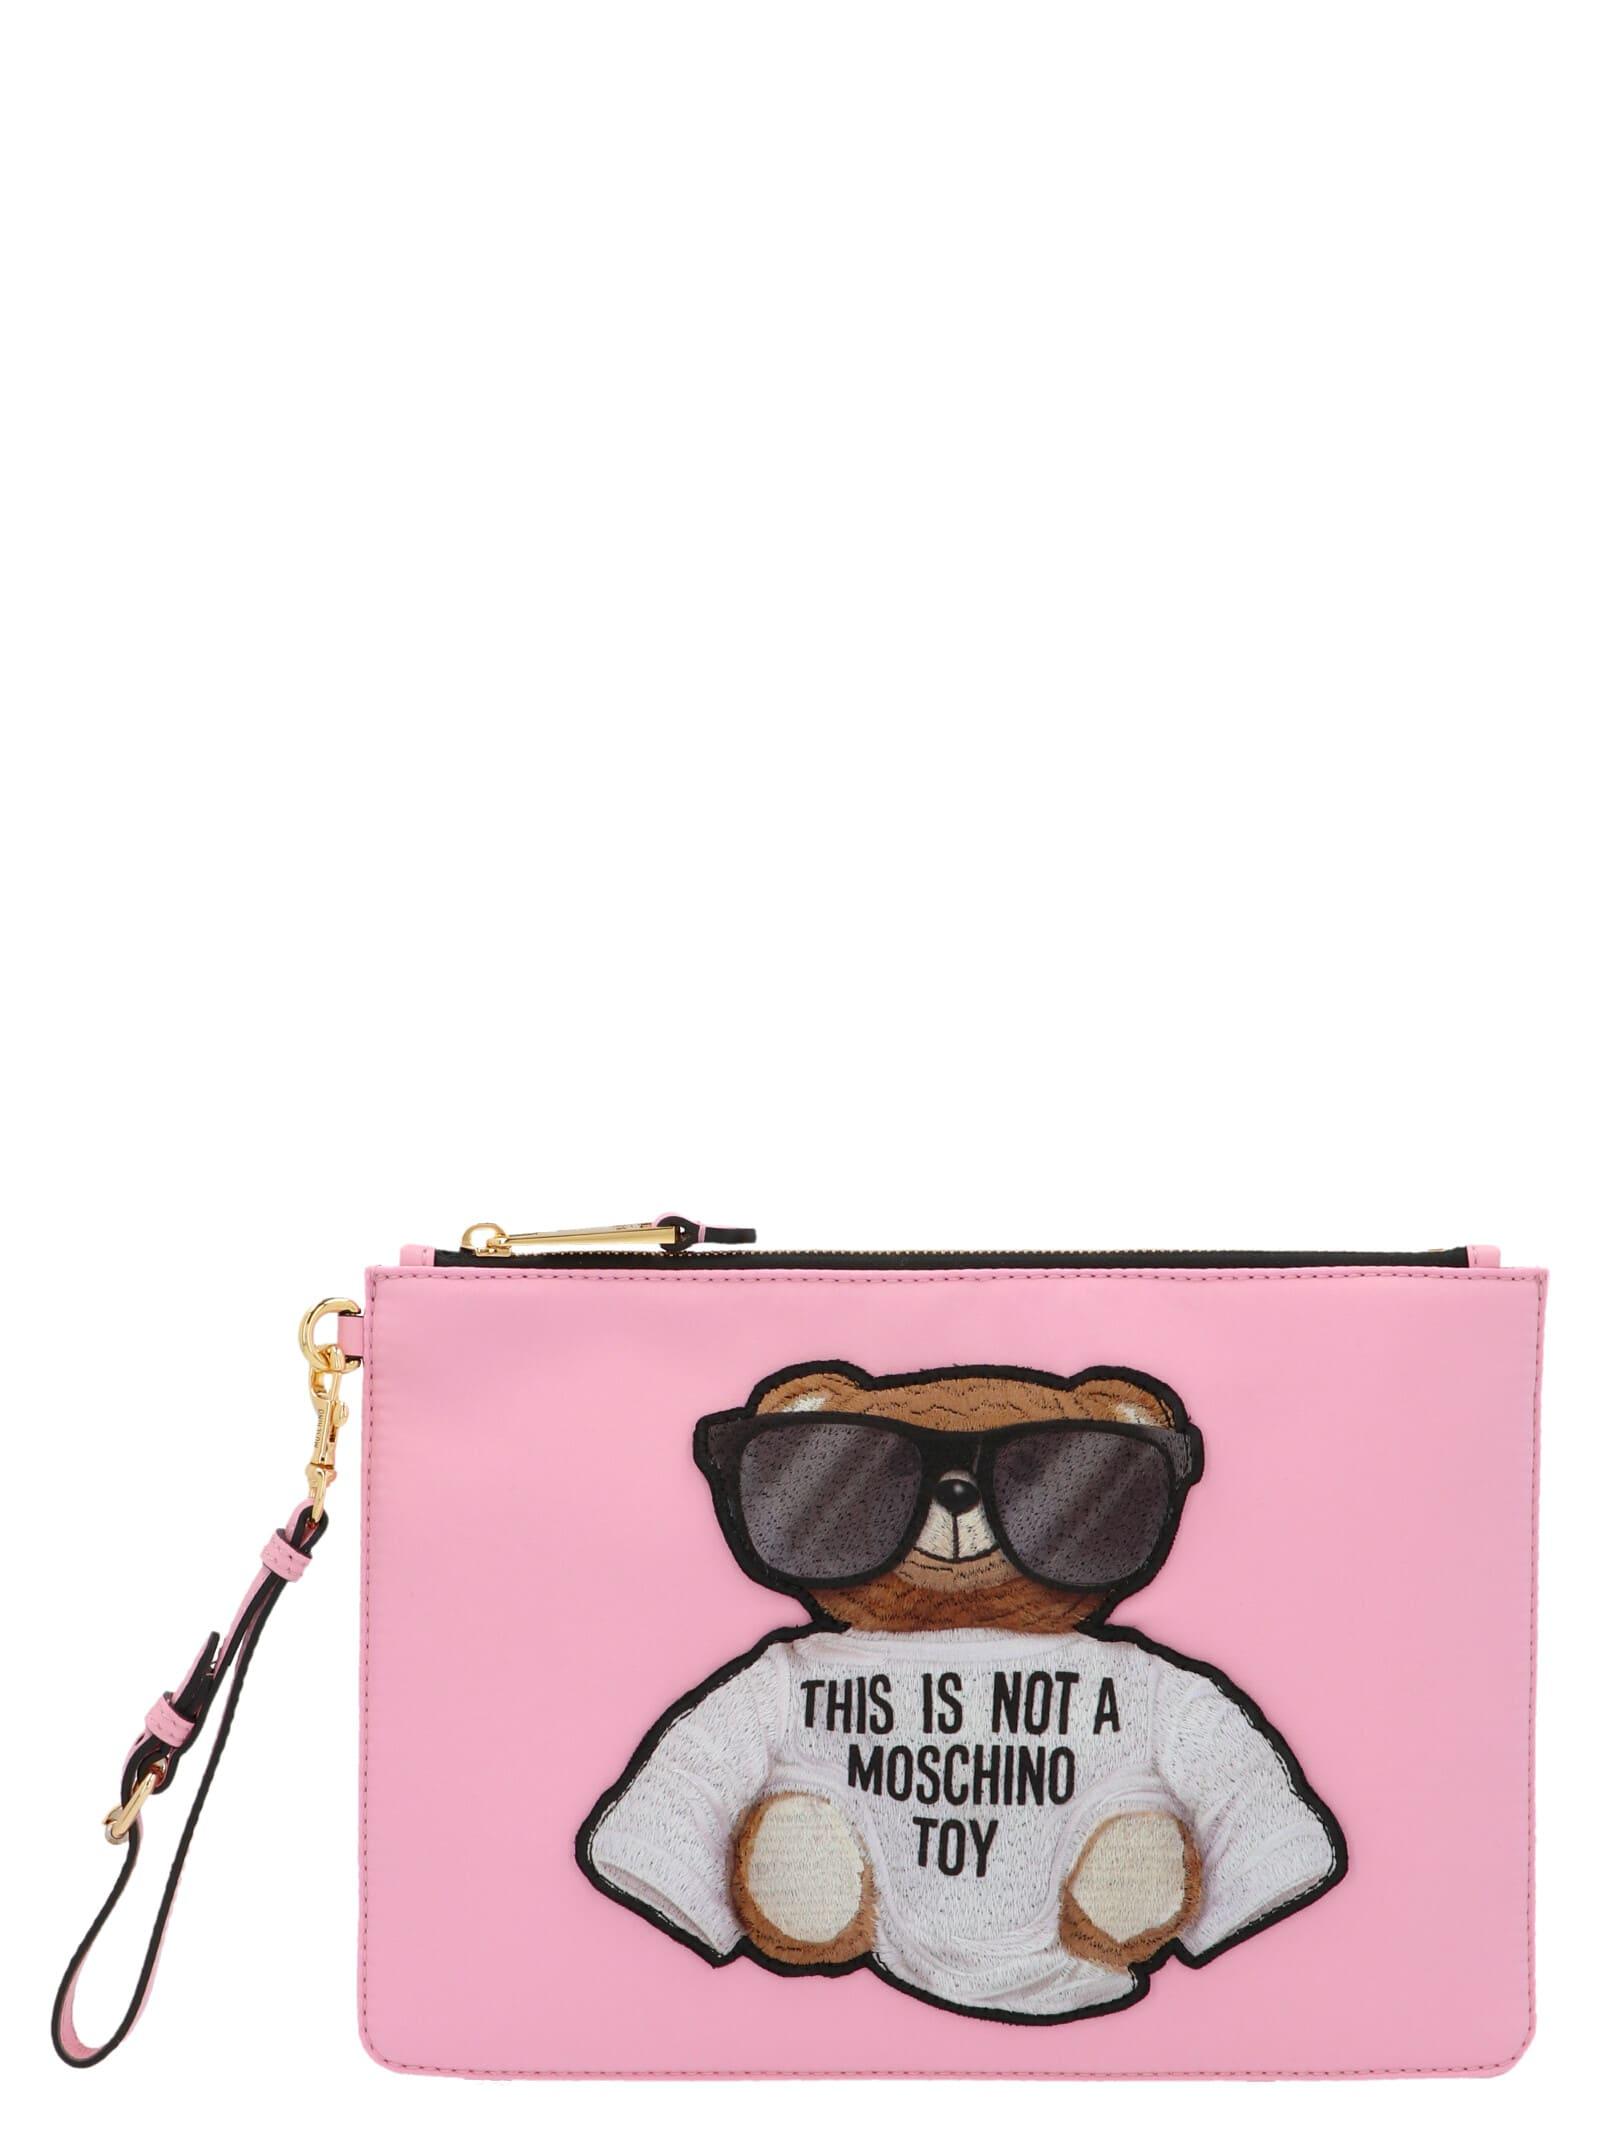 Moschino teddy Bag